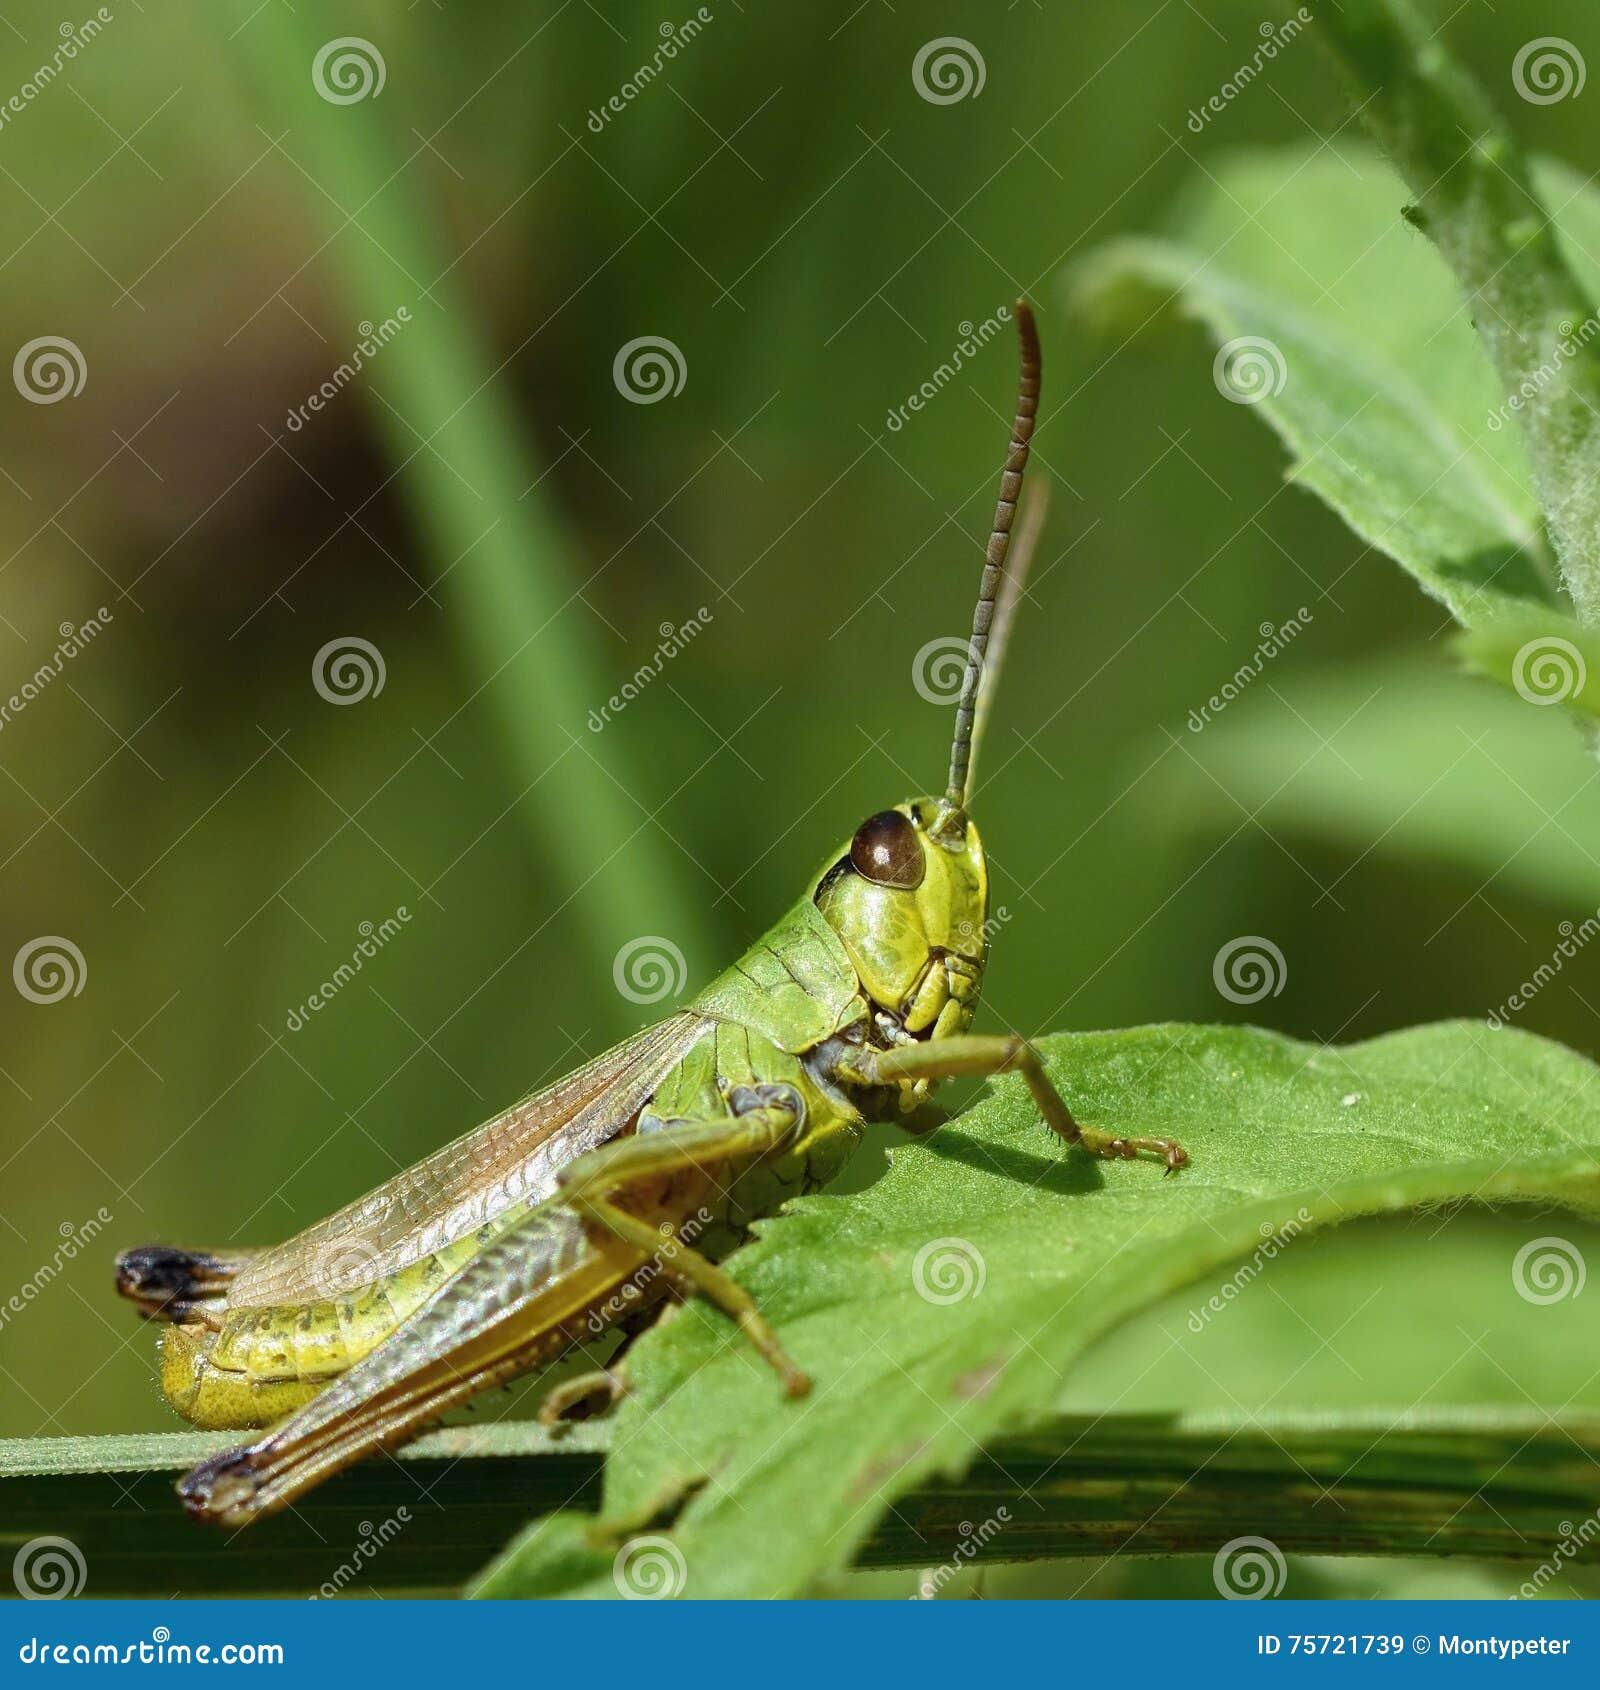 Beautiful macro shot of a grasshopper in the grass. Nature close up.